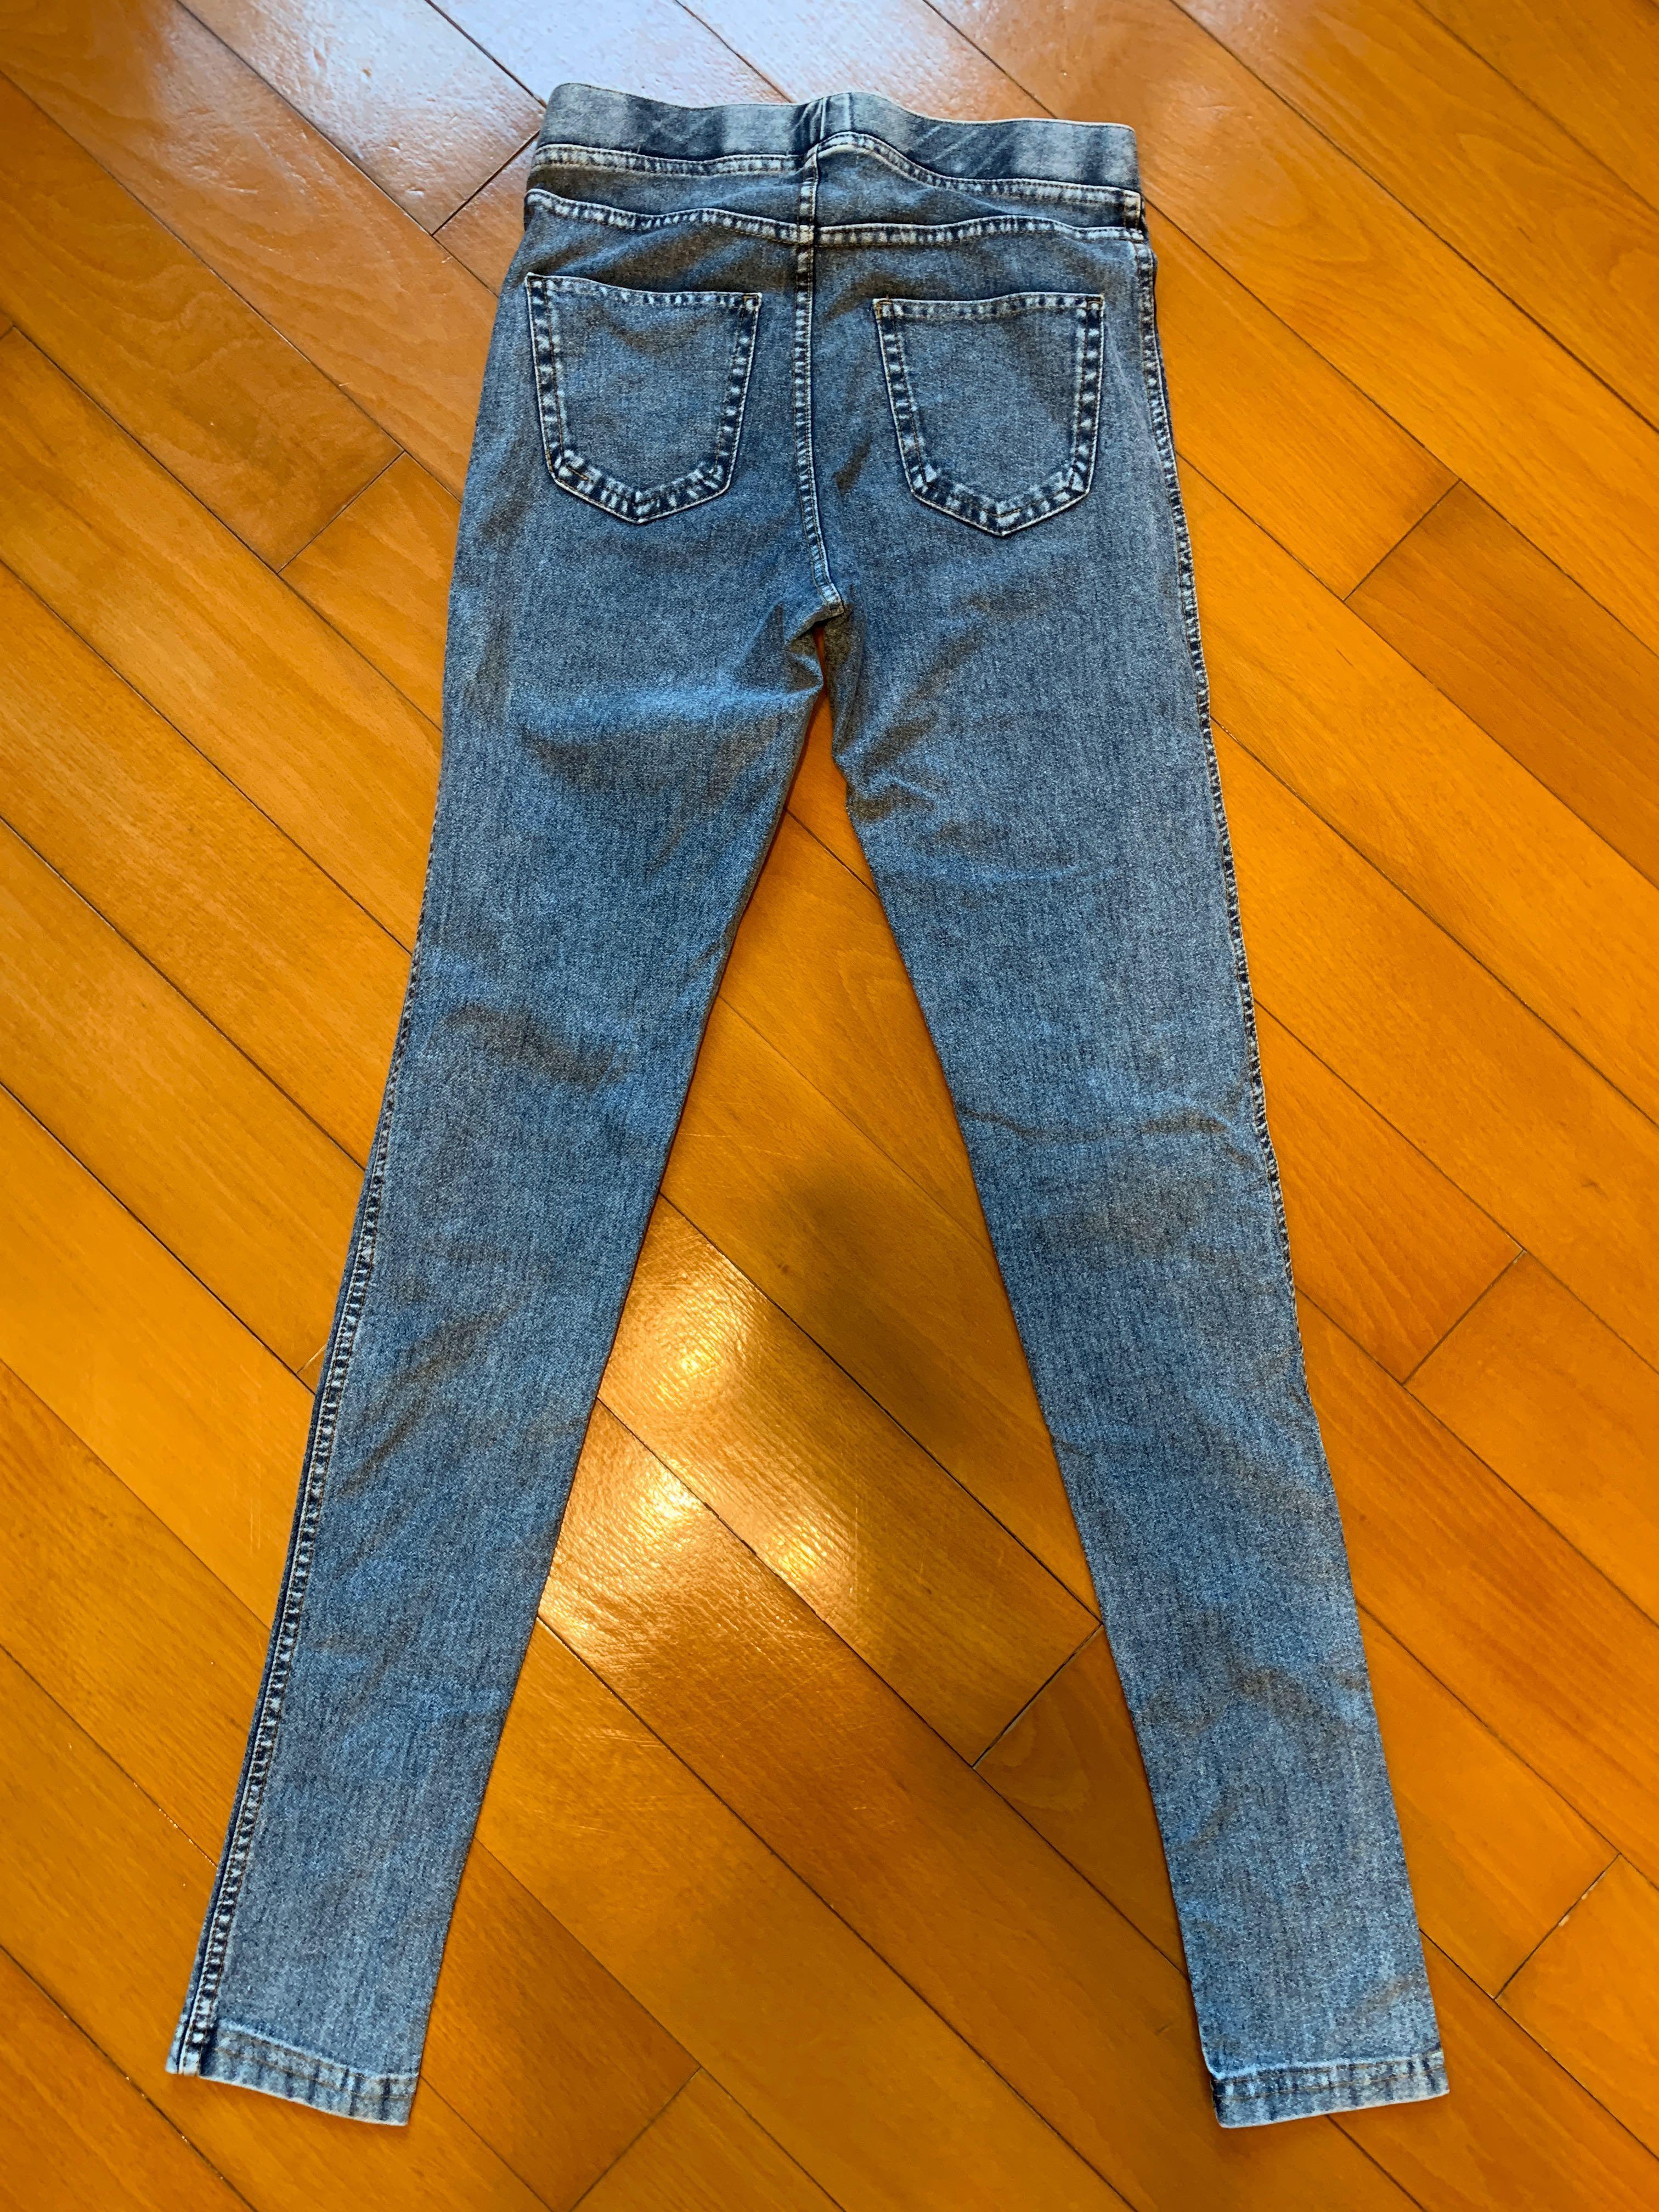 Kids H&M denim leggings 女童牛仔貼身褲